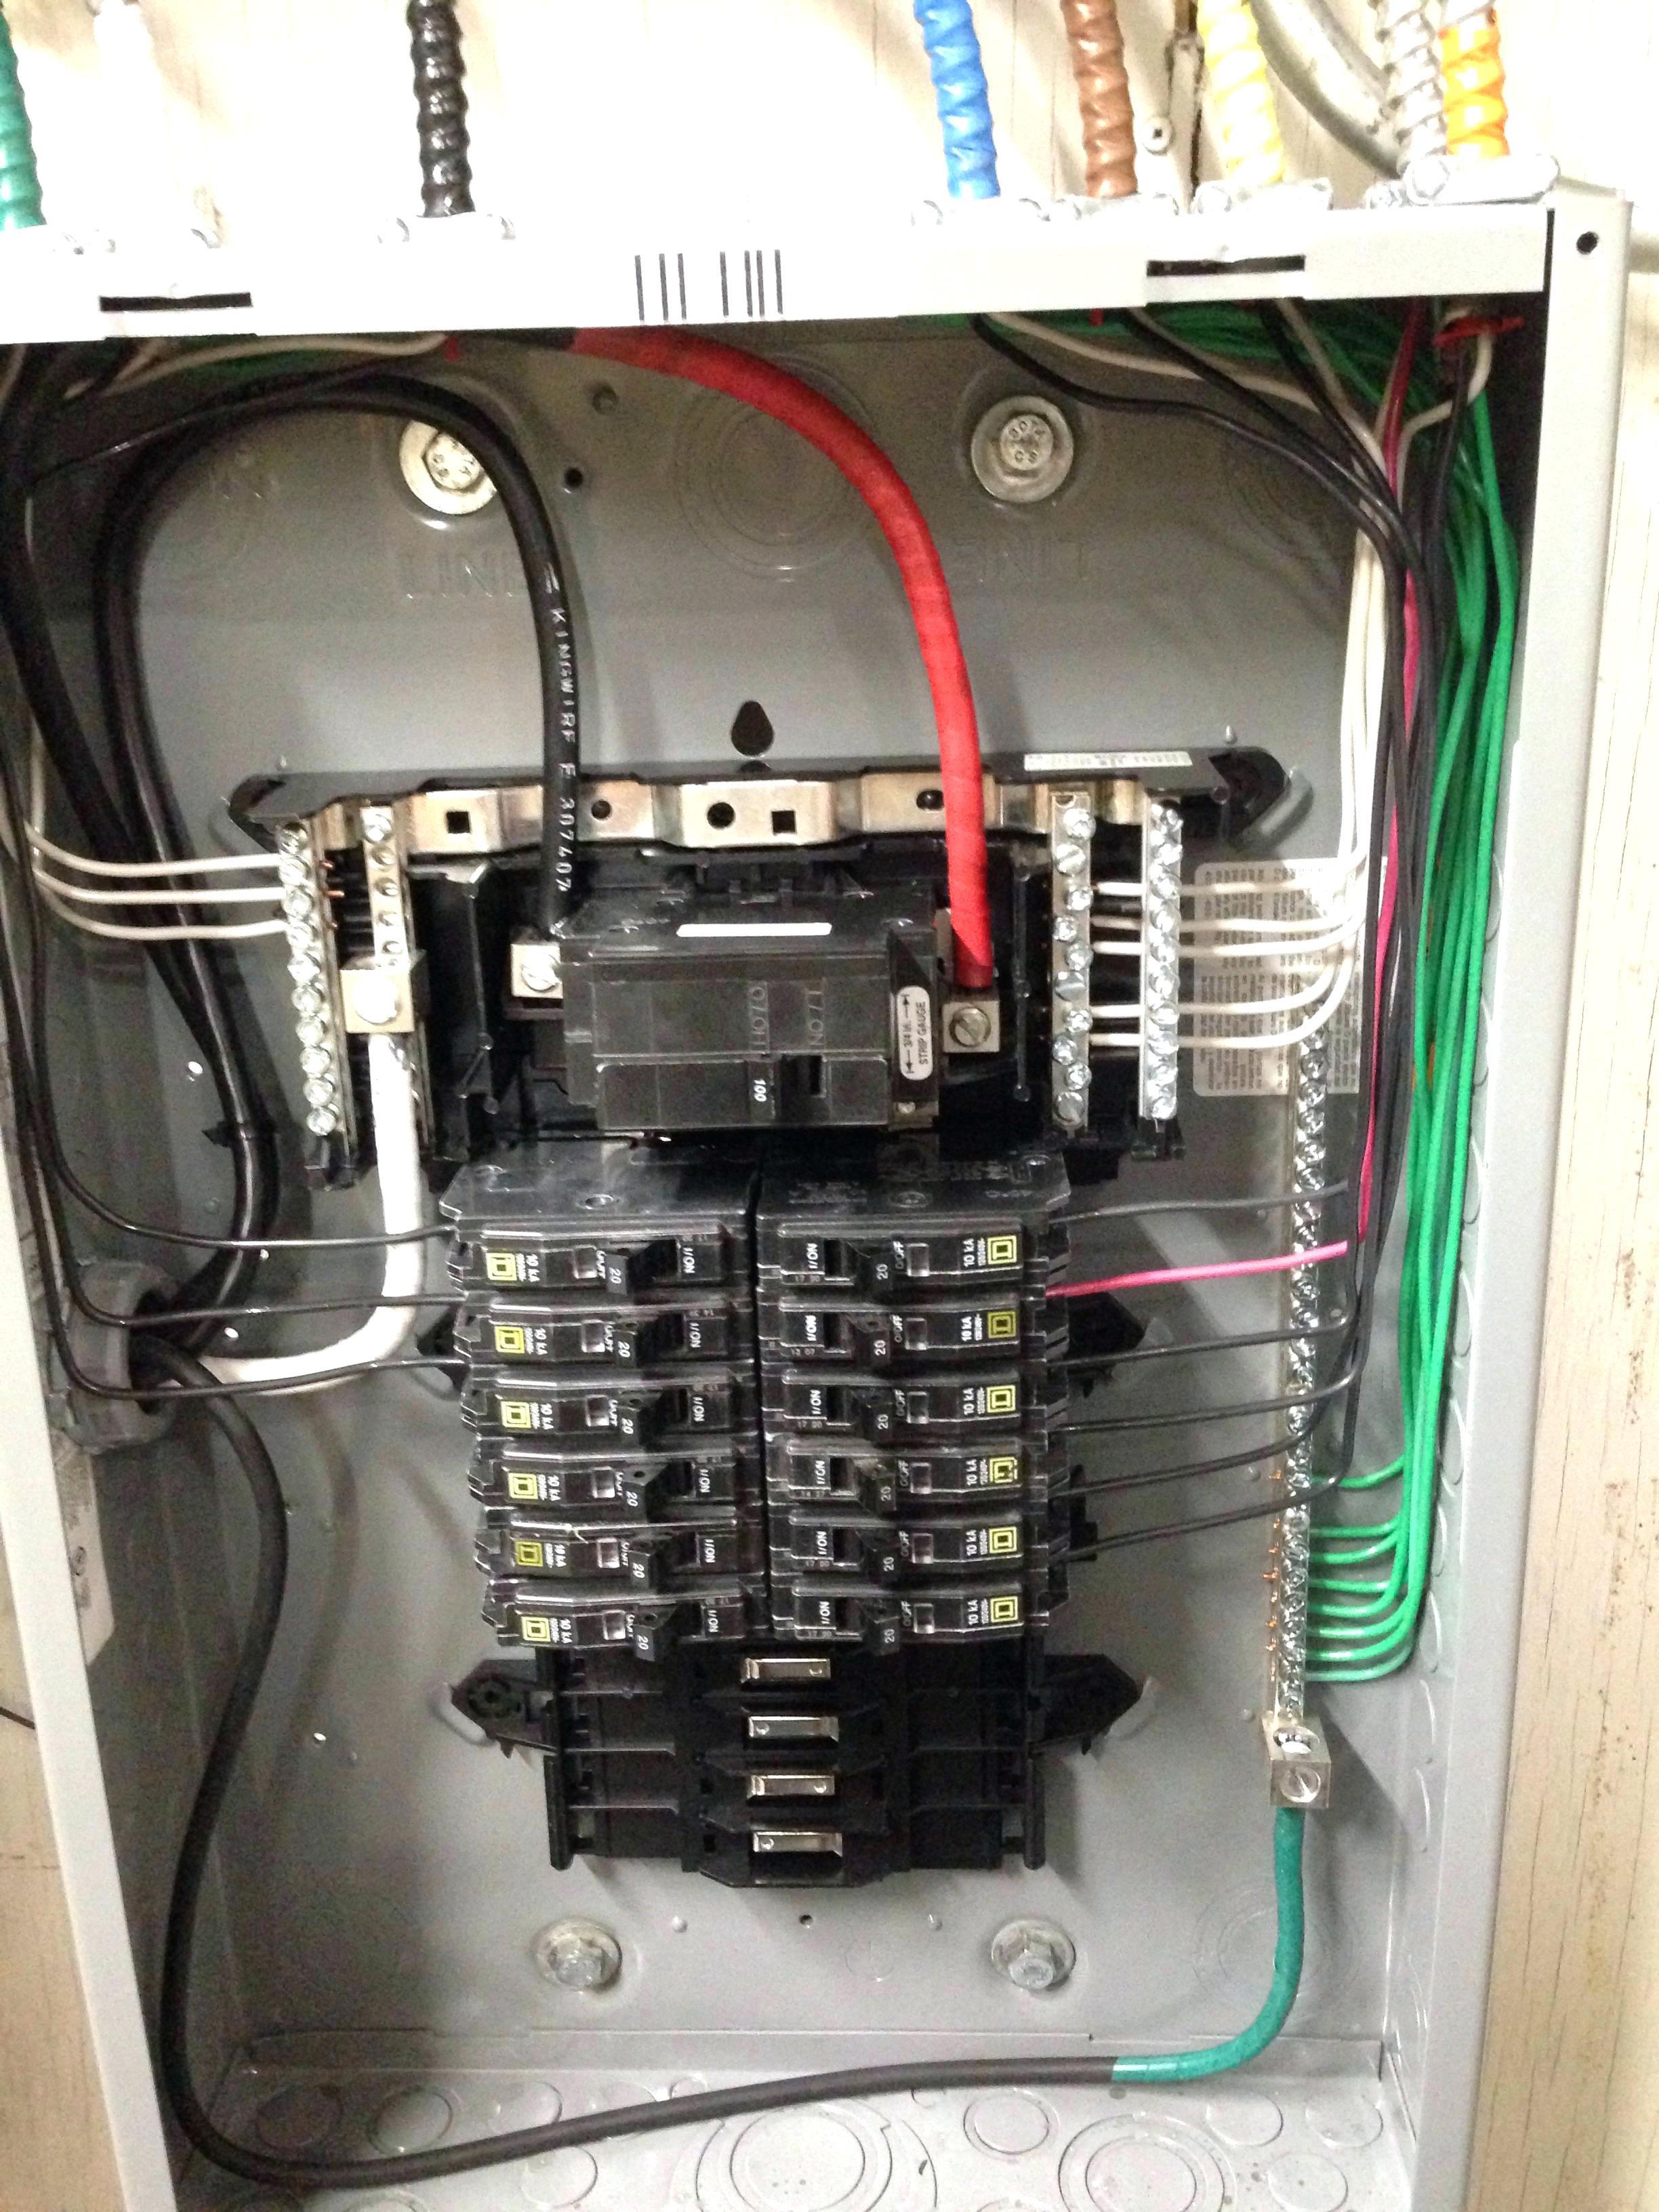 Schematic 100 Amp Breaker Box | Wiring Diagram - 100 Amp Sub Panel Wiring Diagram